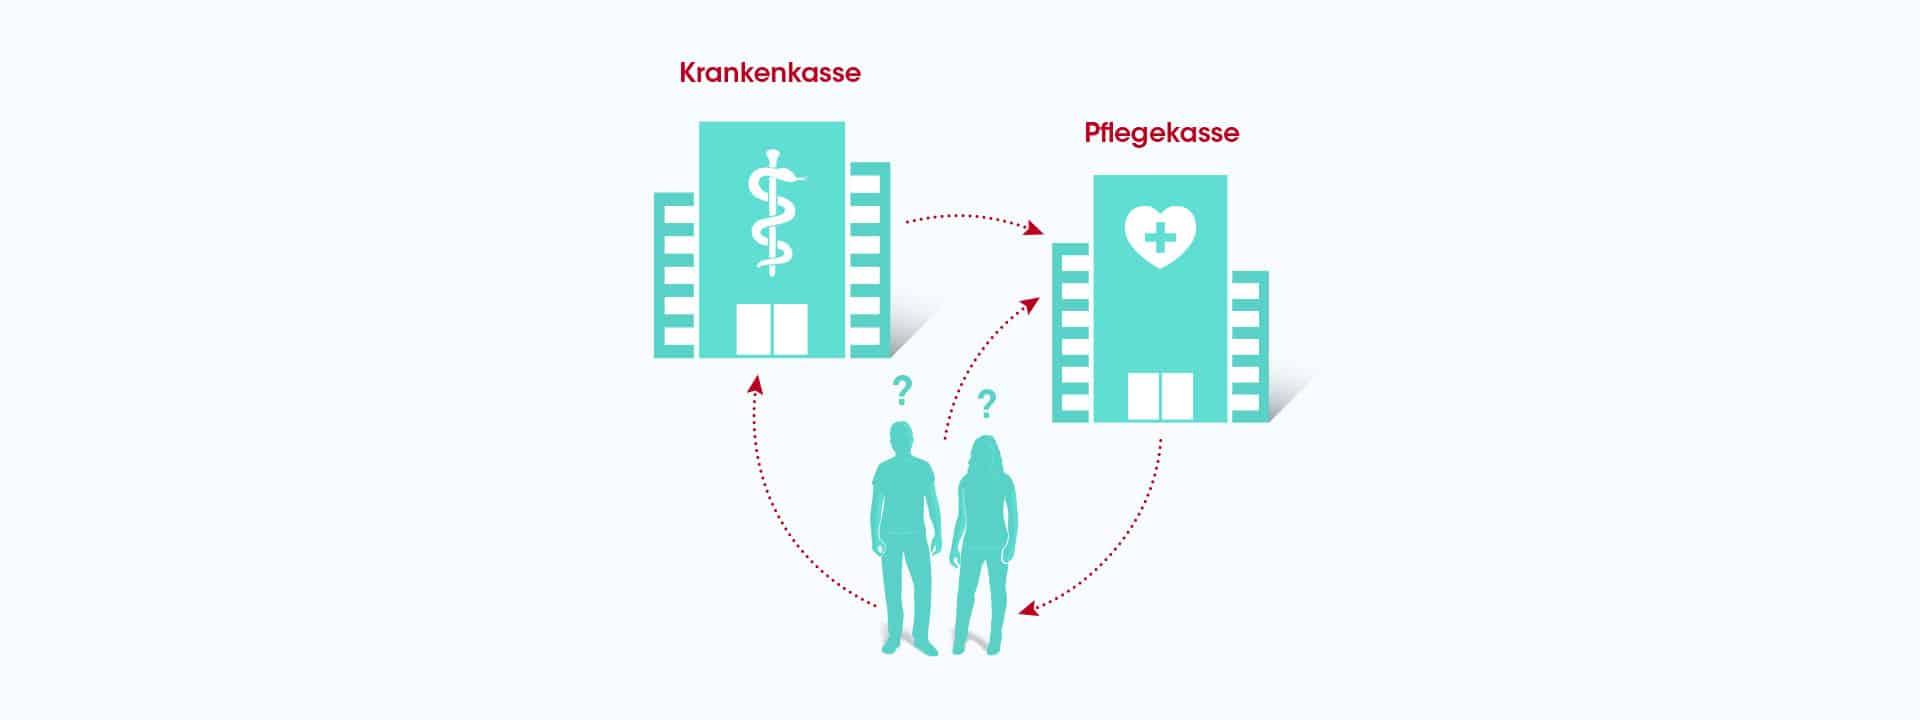 Zuerst Krankenkasse oder Pflegekasse bei Epidermolysis Bullosa?